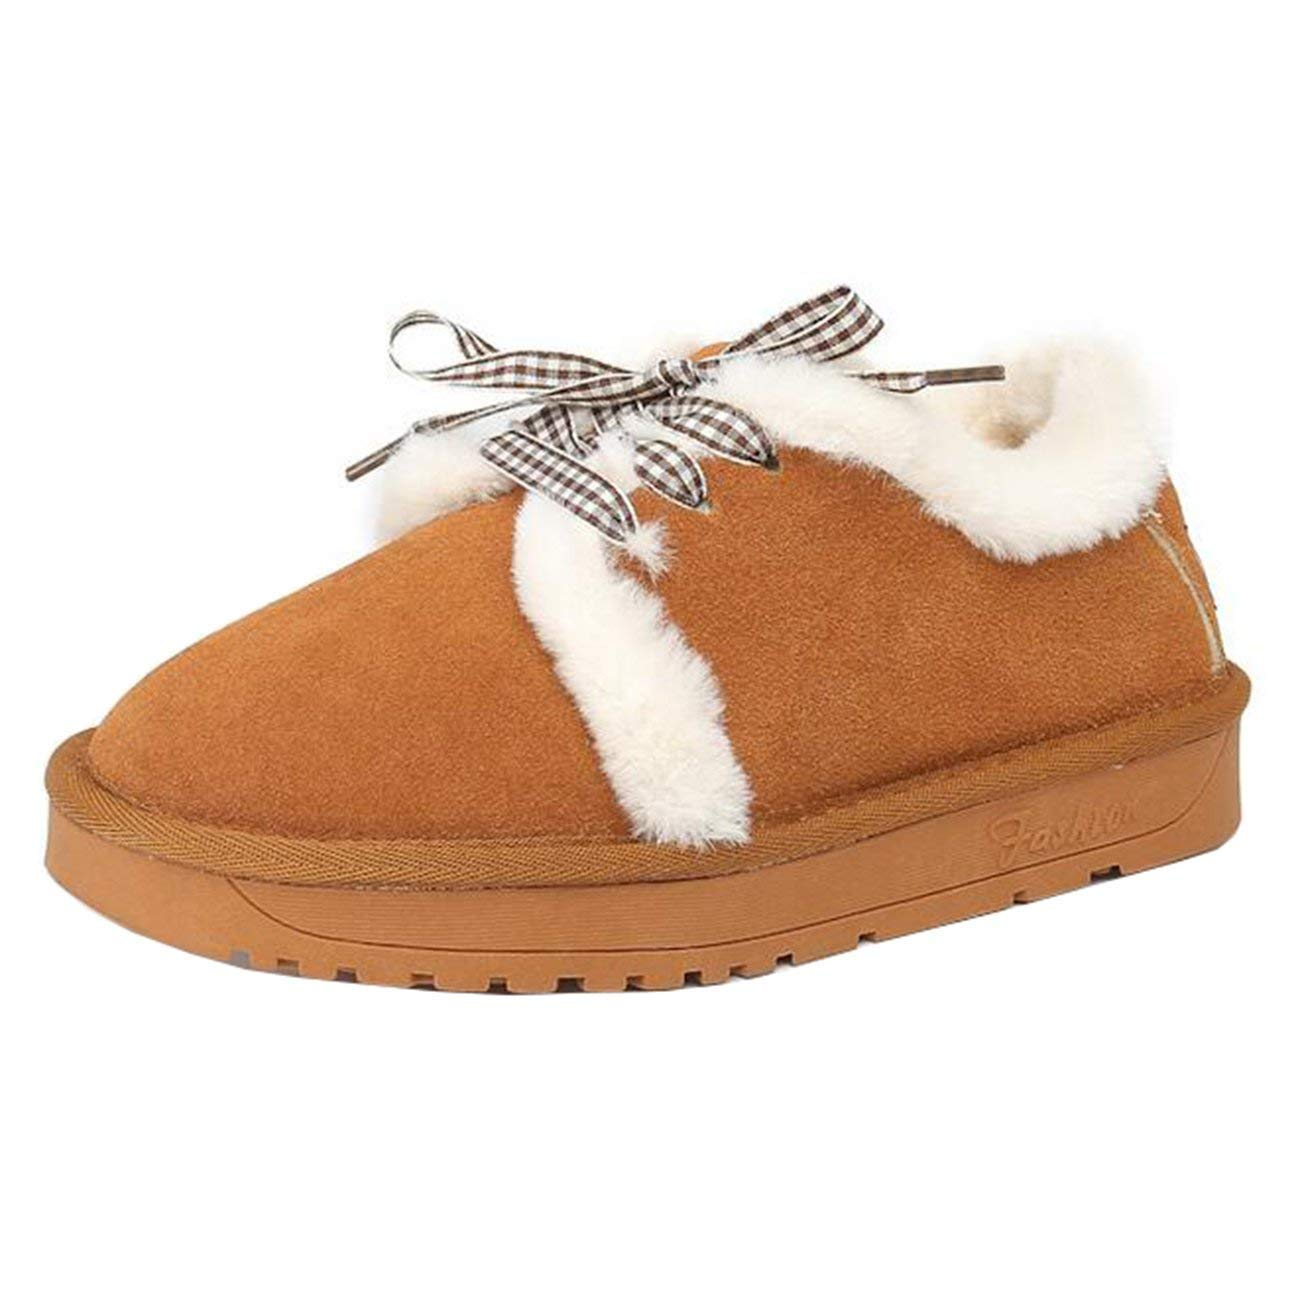 Fuxitoggo Damen Runde-Toe Flache Schnür-Fell Schneeschuhe Schneeschuhe Schneeschuhe (Farbe   Braun Größe   7 UK) a11866